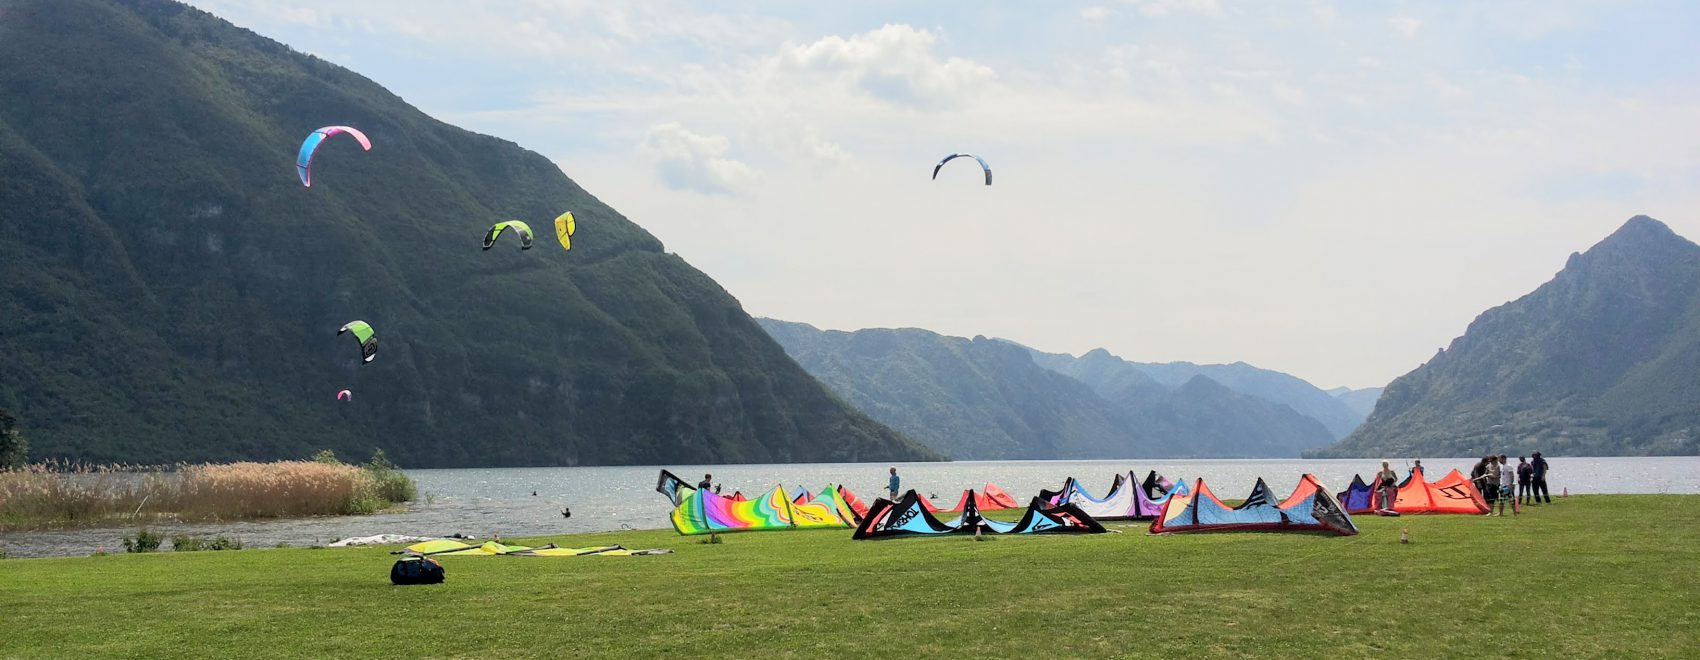 sport del Kitesurf sul lago d'idro